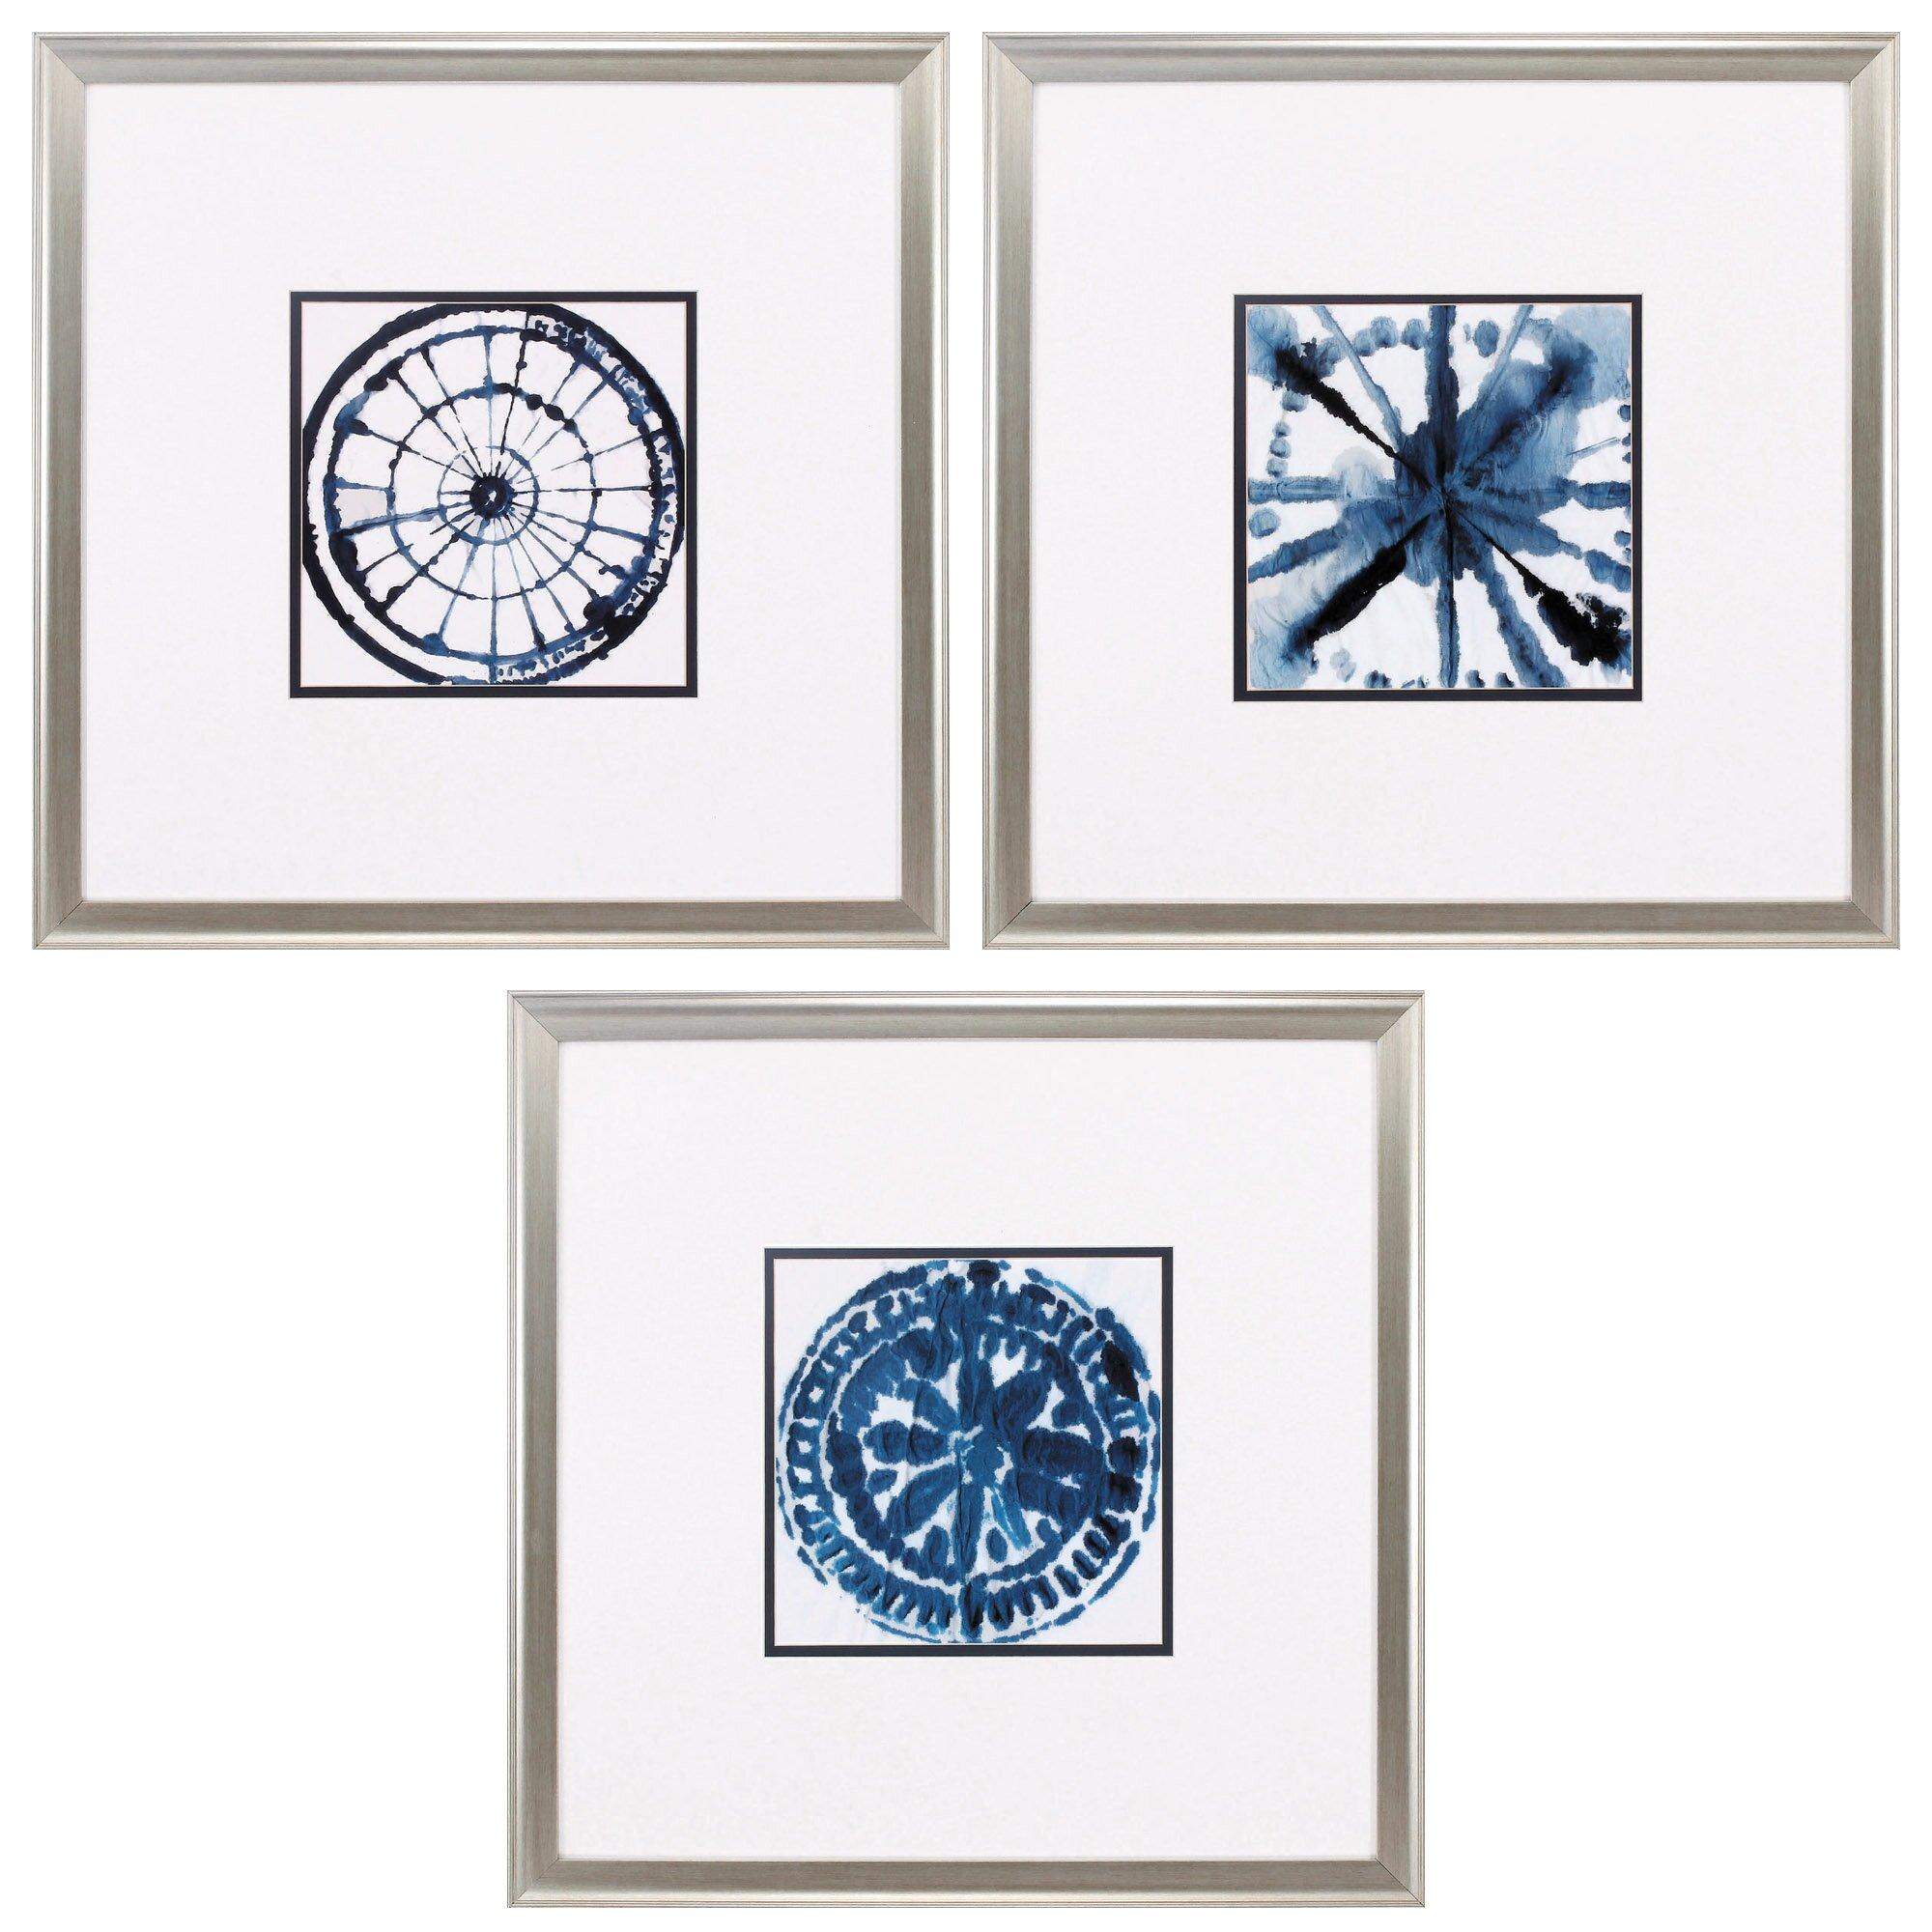 Propac Images Indigo Dye 3 Piece Framed Graphic Art Set